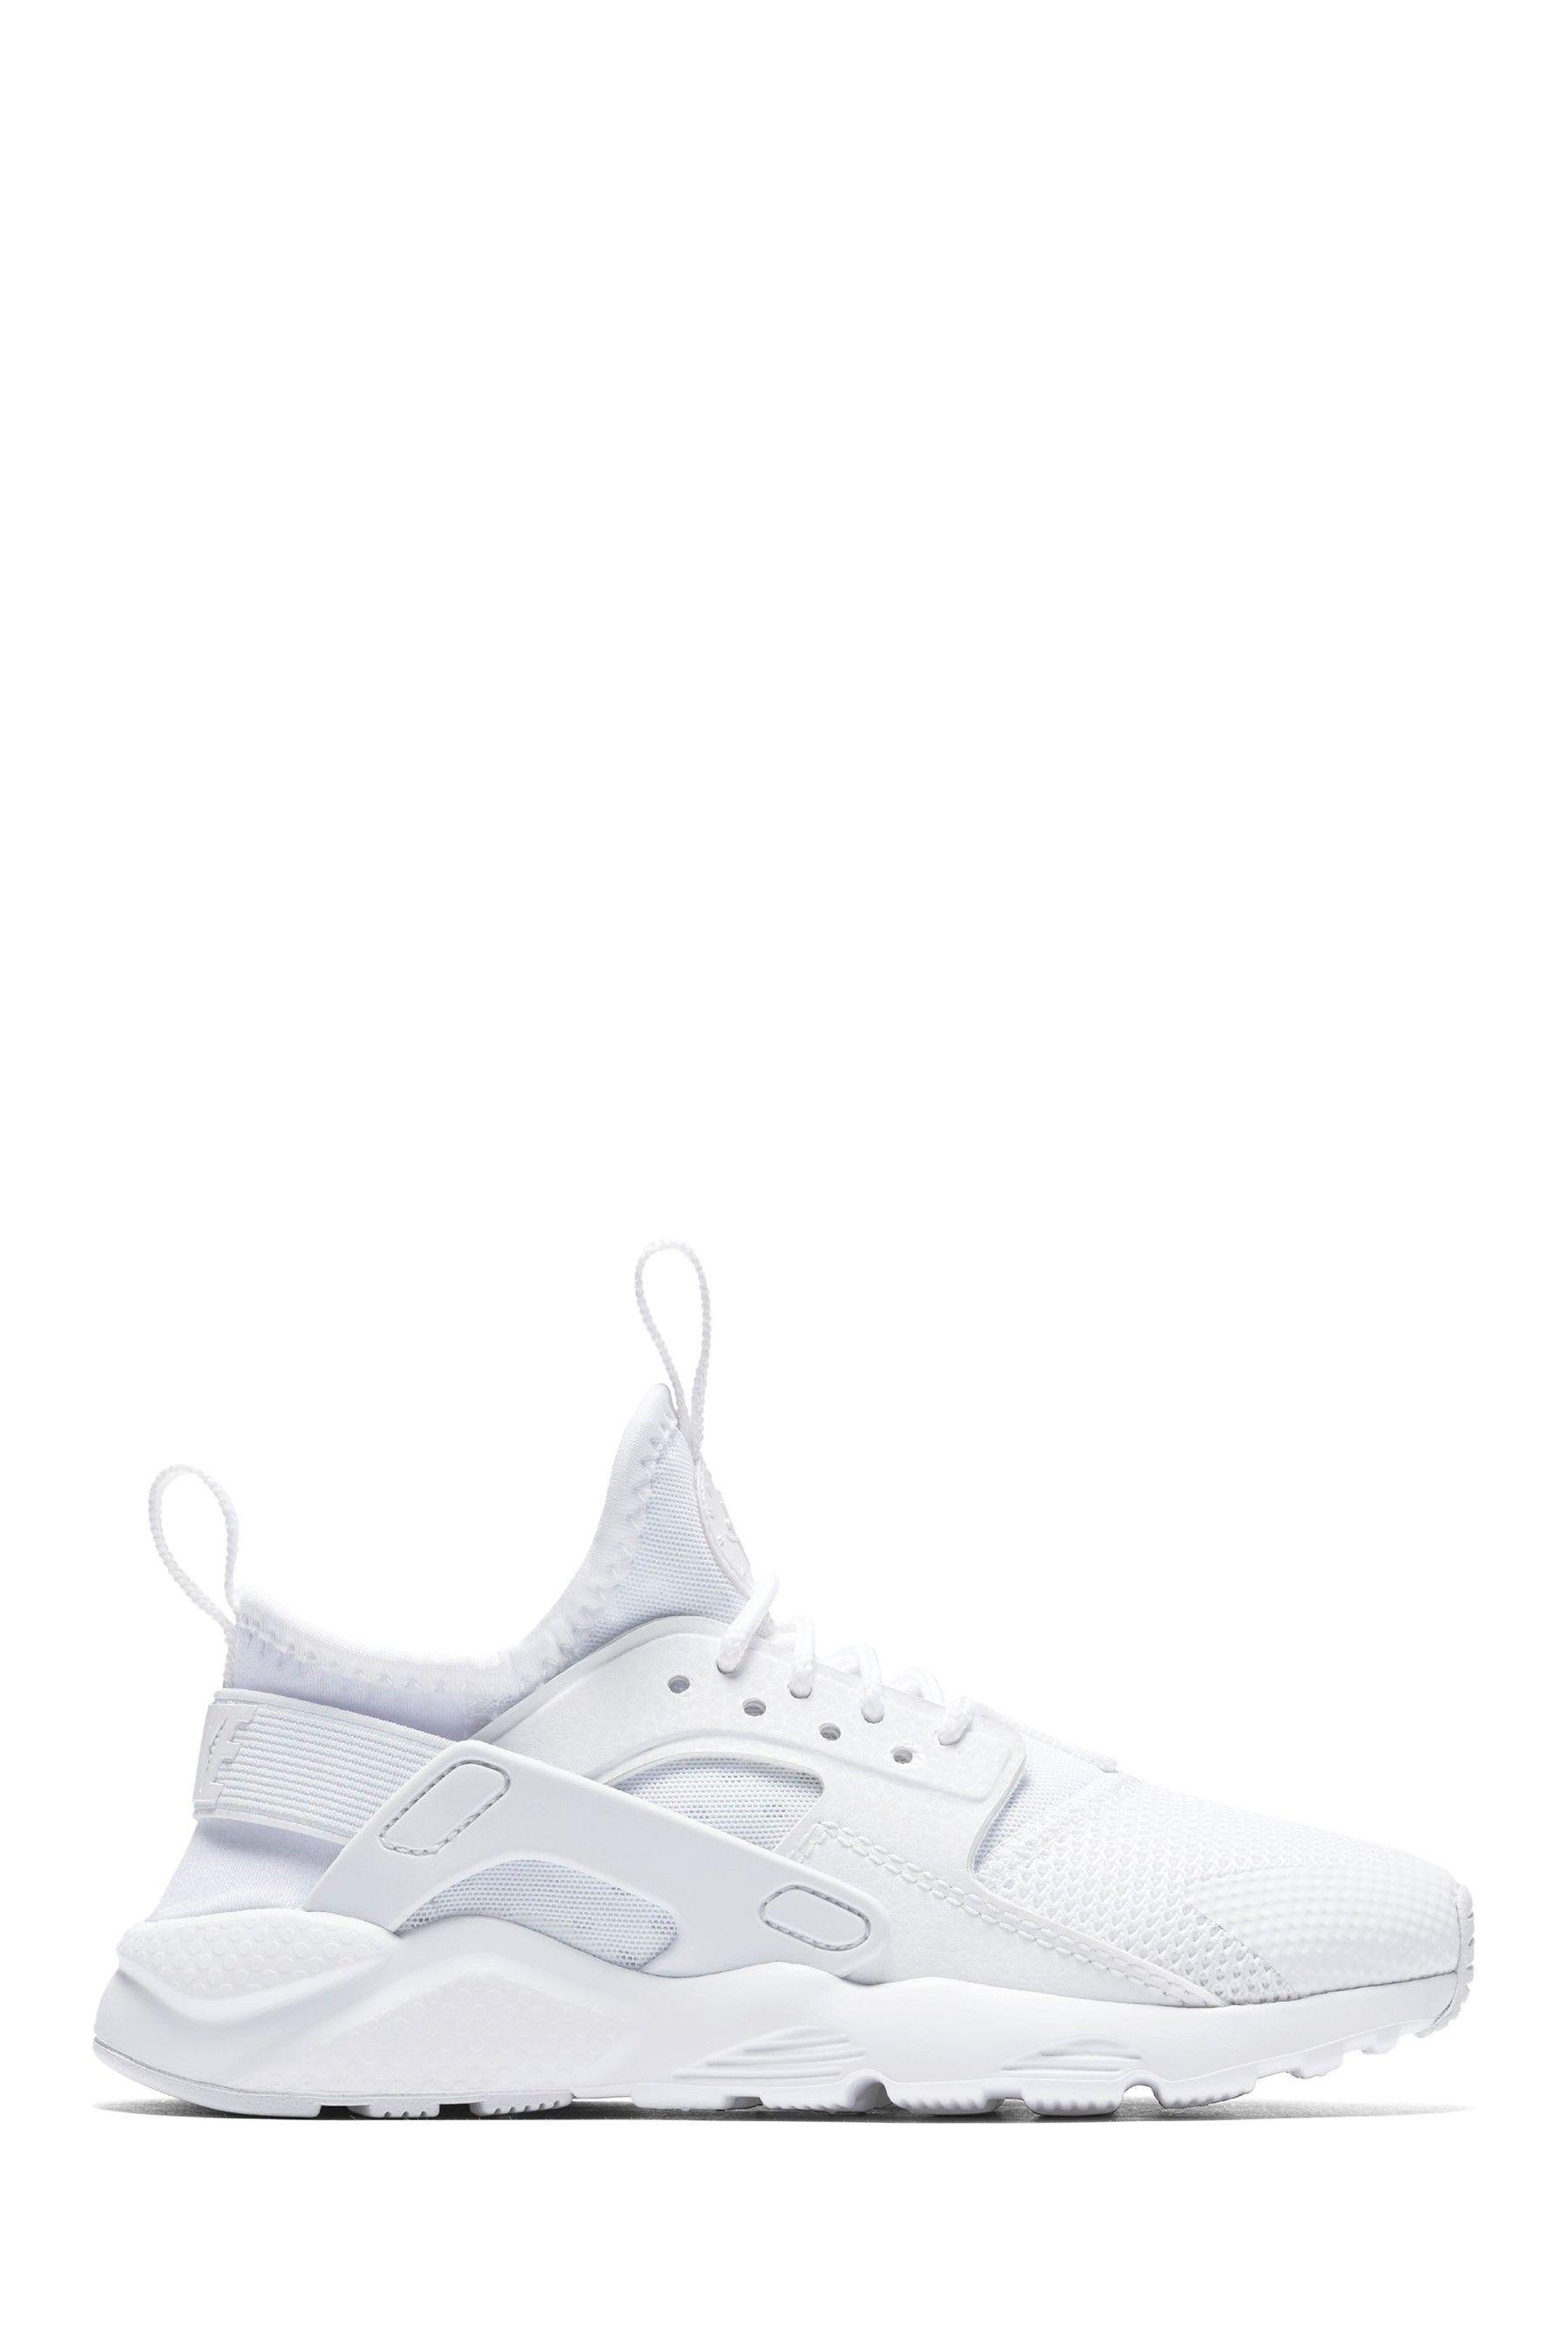 half off 3fe26 42feb Boys Nike Huarache Junior - White in 2019   Products   Nike ...